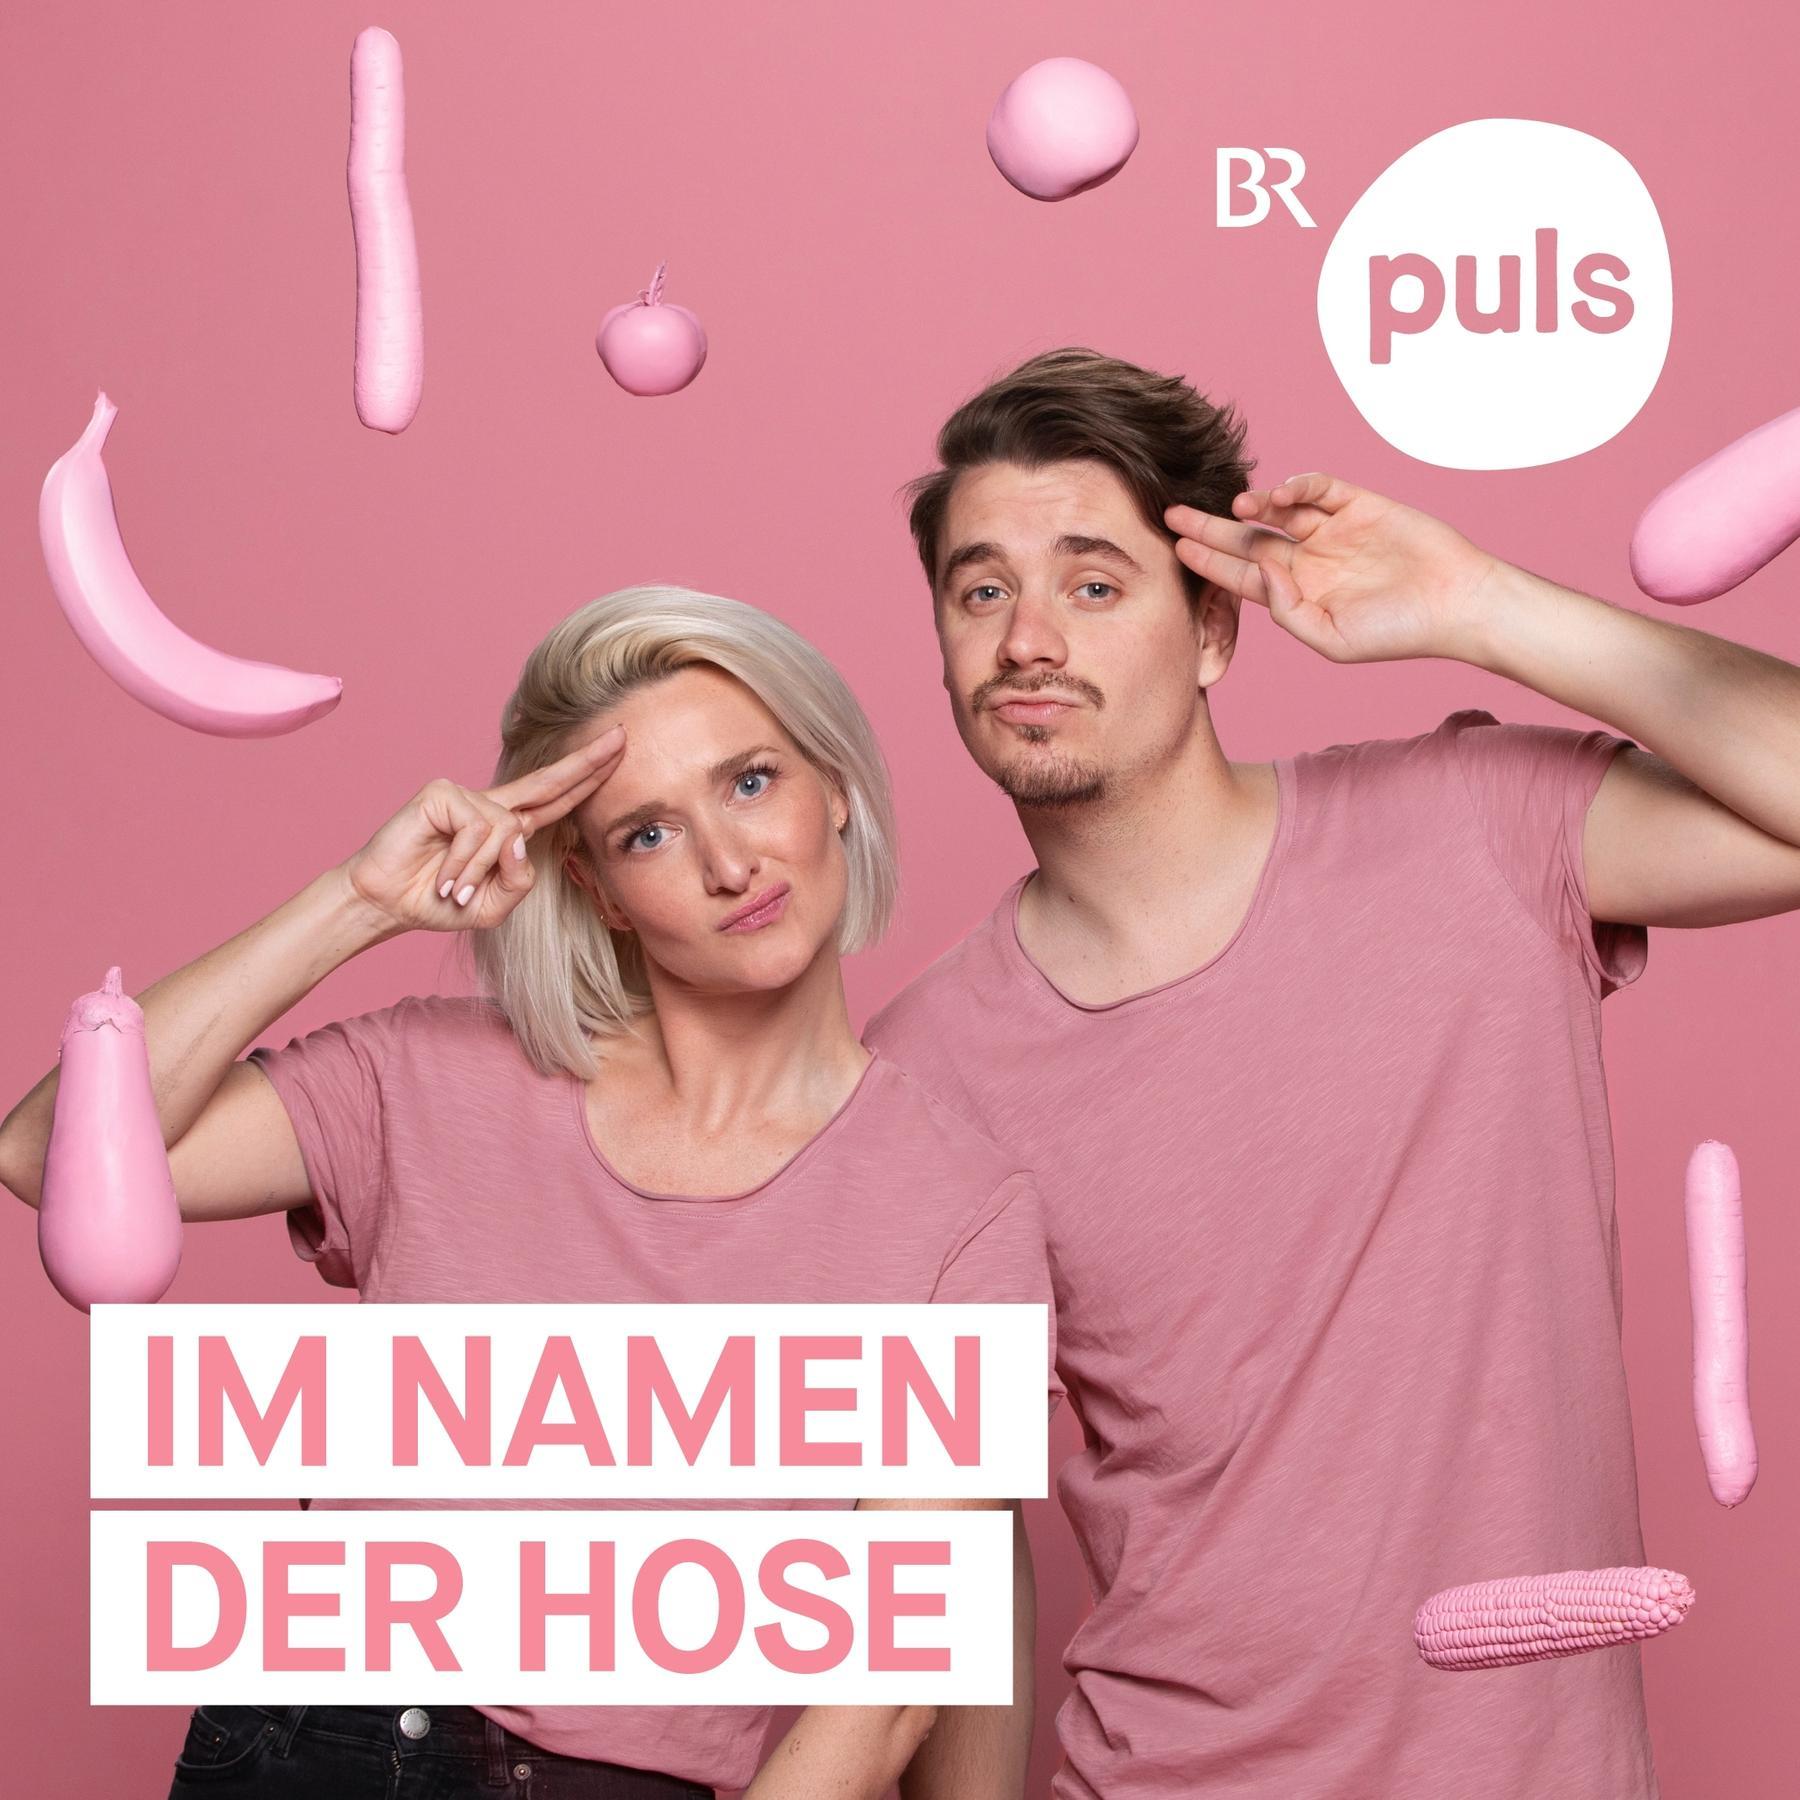 Verrückte Sexmomente (live beim PULS Podcastfestival)